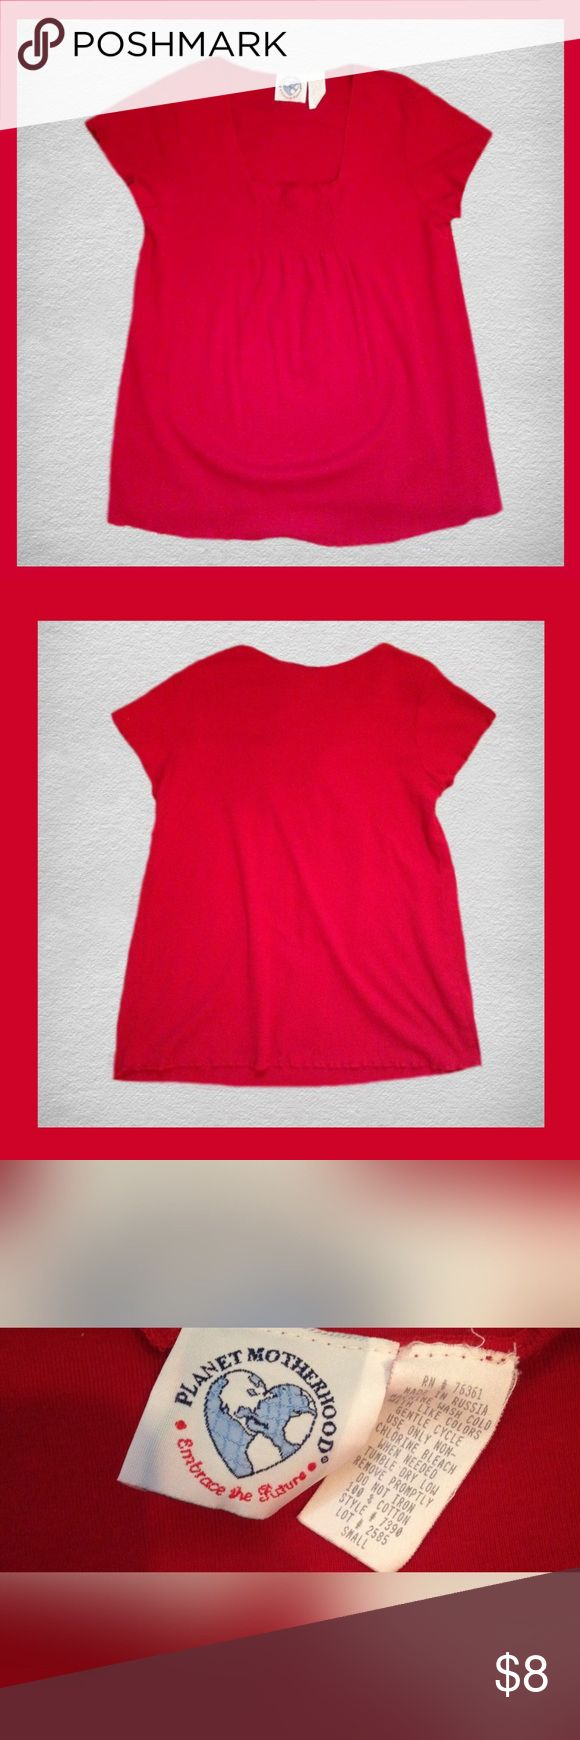 ONE DAY SALEPLANET MOTHERHOOD Shirt Gently used PLANET MOTHERHOOD short sleeve MATERNITY shirt; Size small. *****BUNDLE AND SAVE ***** Planet Motherhood Tops Tees - Short Sleeve